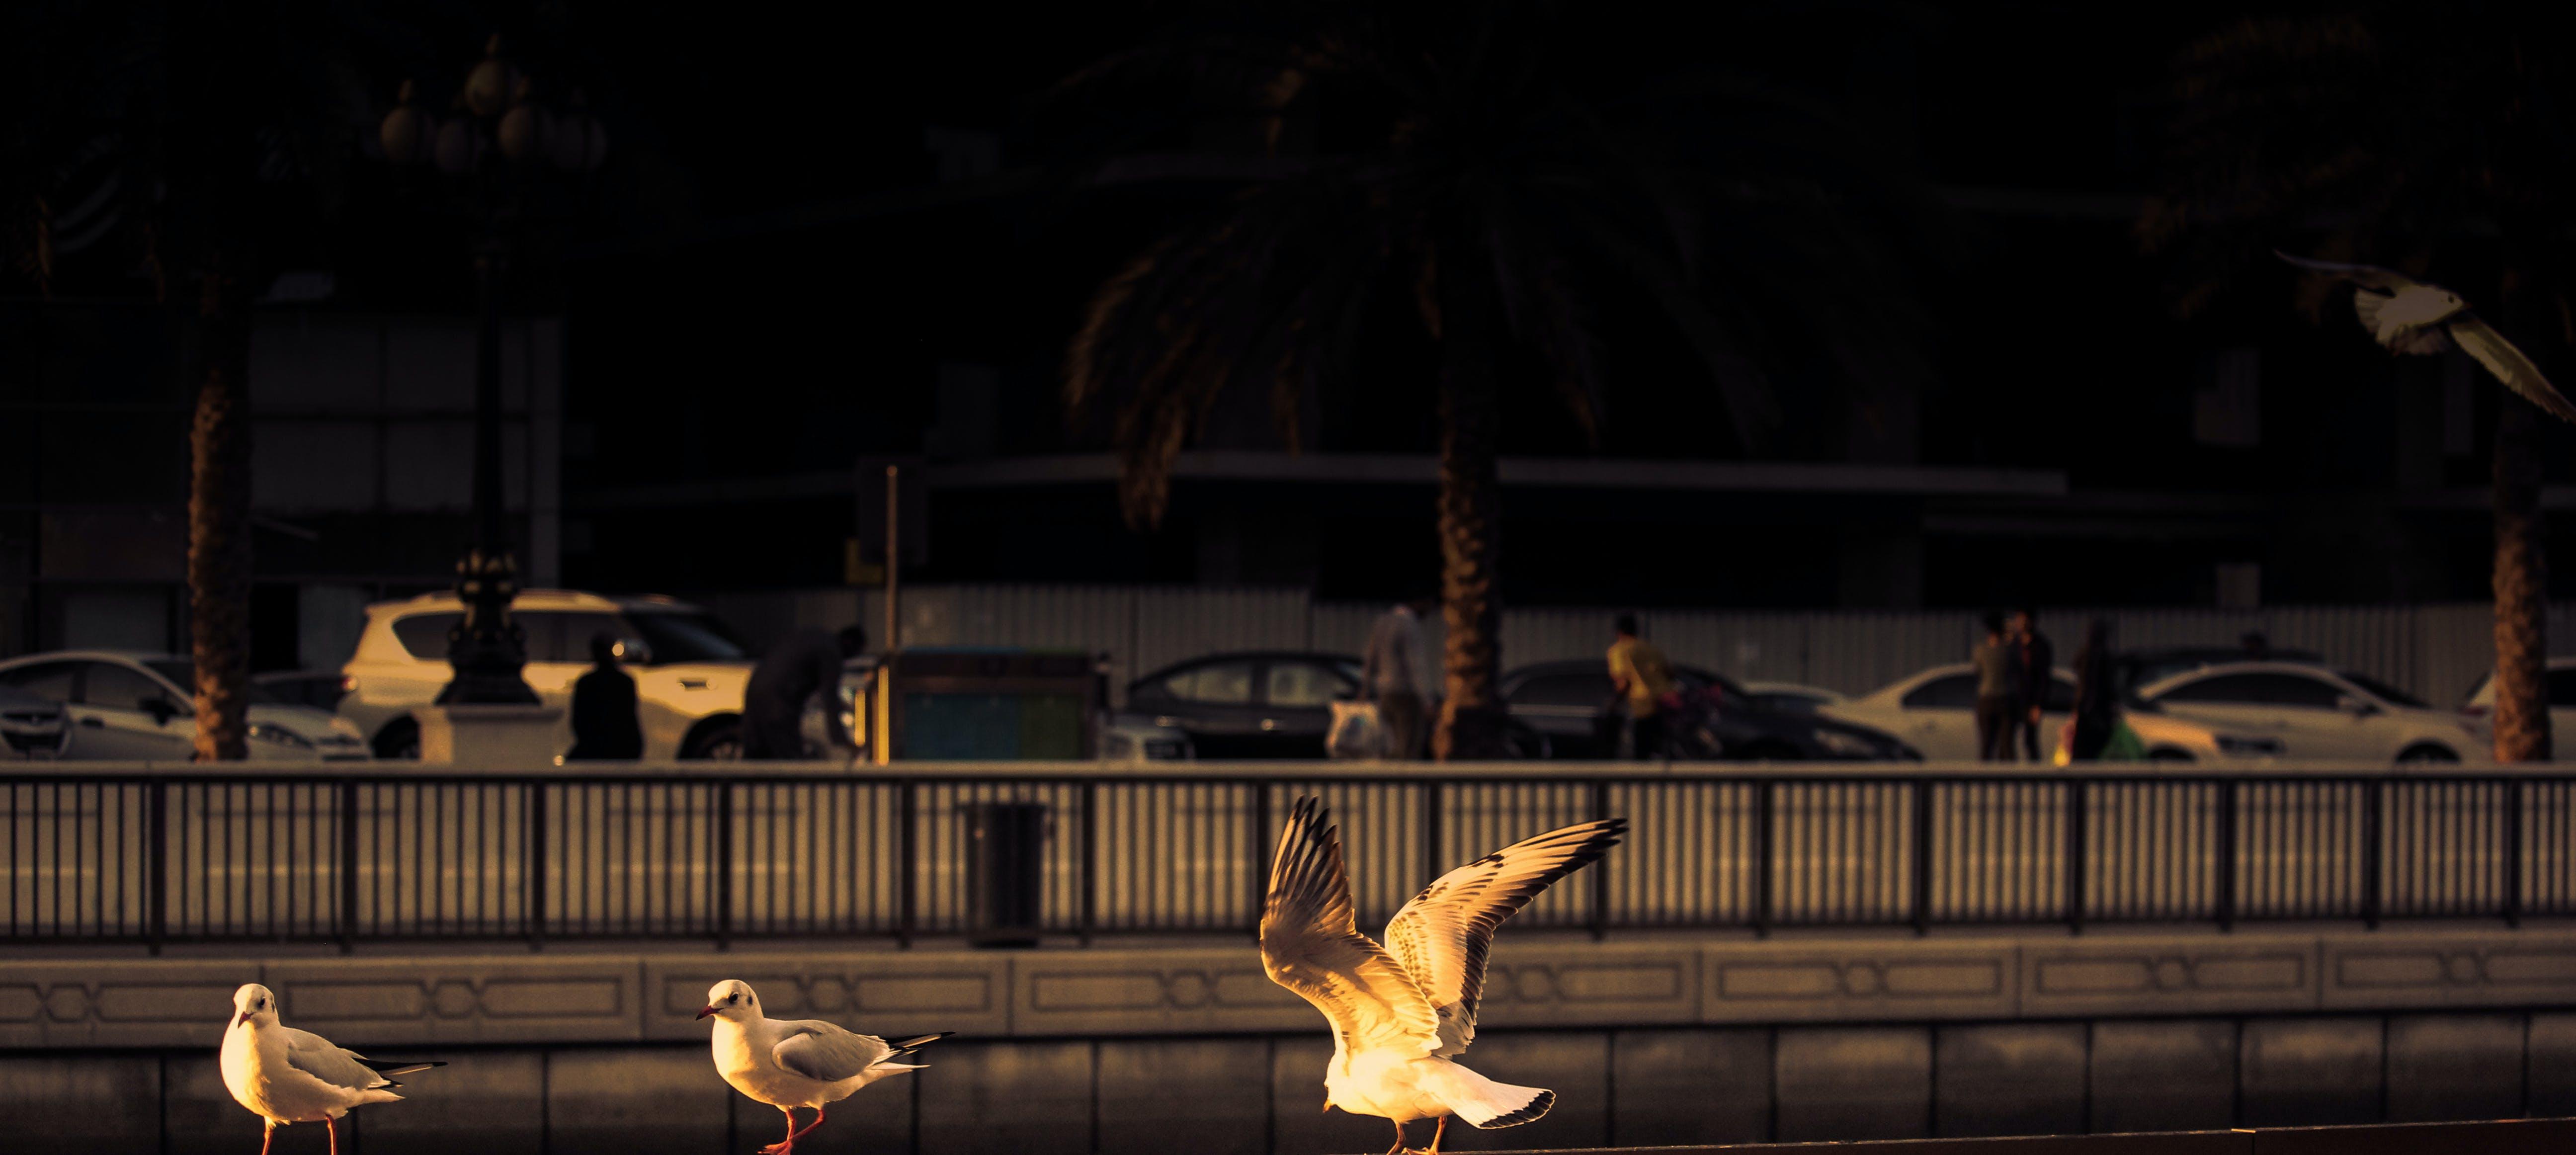 Free stock photo of dubai, flying, Lowlight, sunset